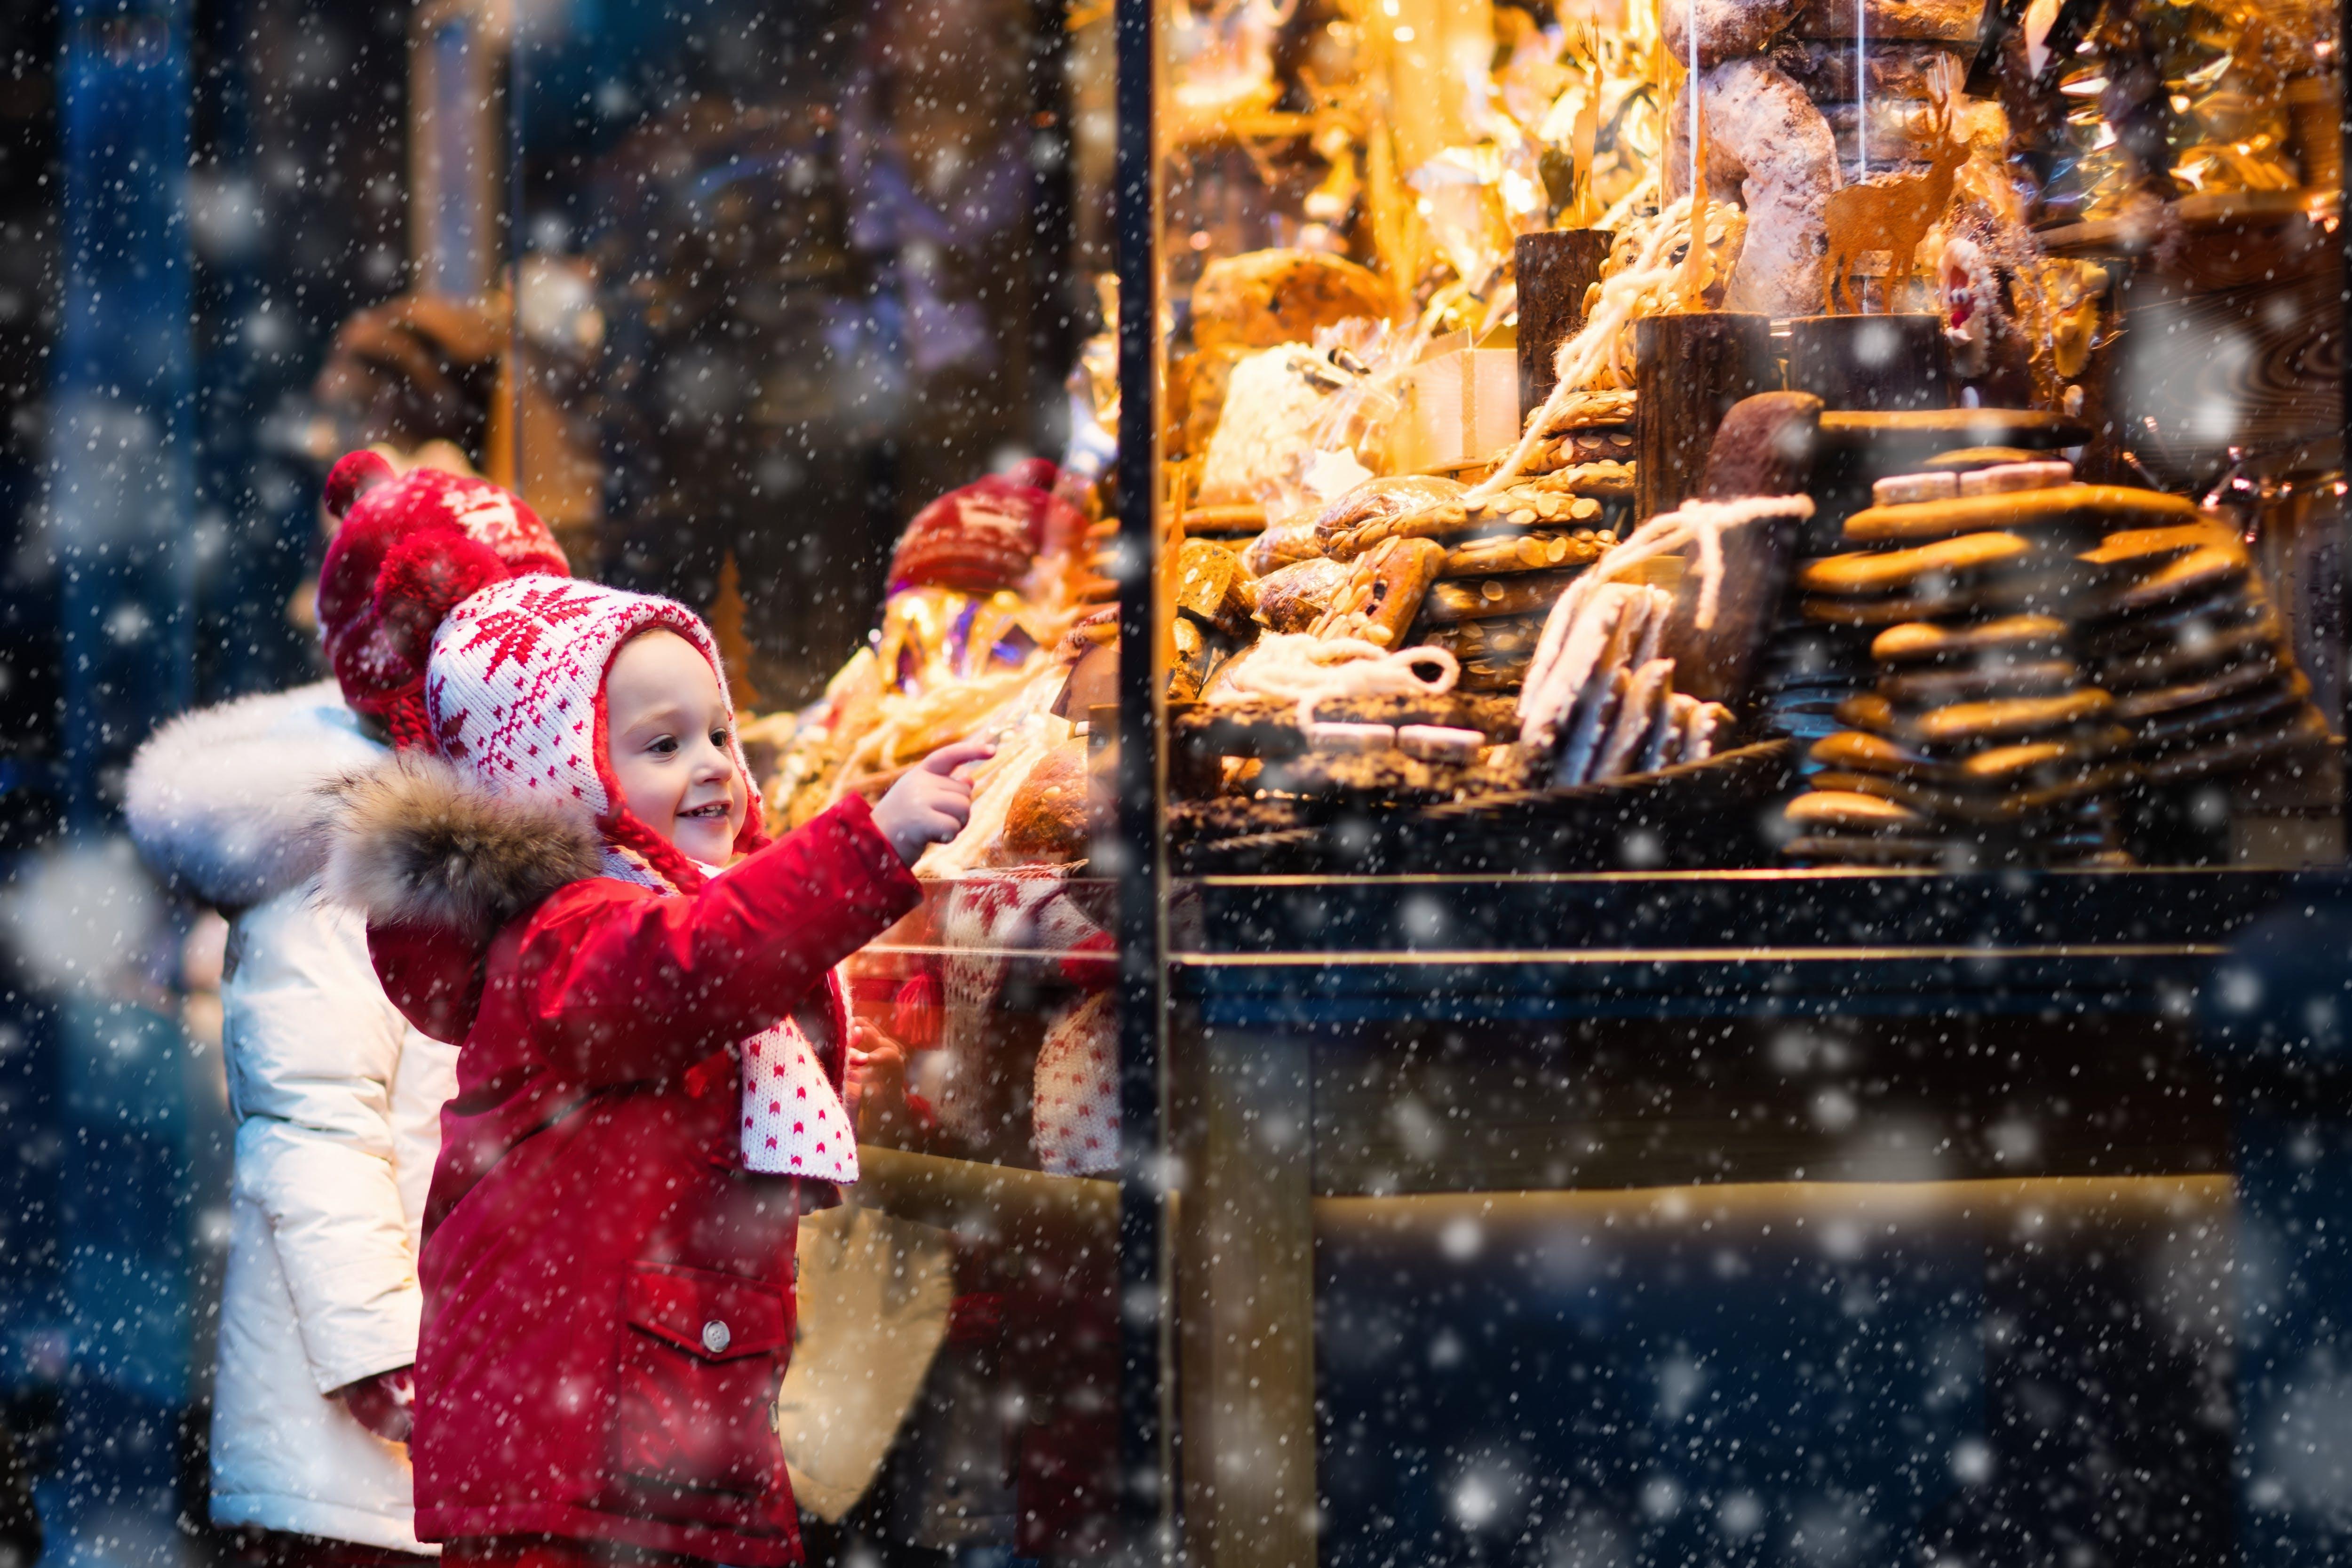 Little girl enjoying a Christmas Market